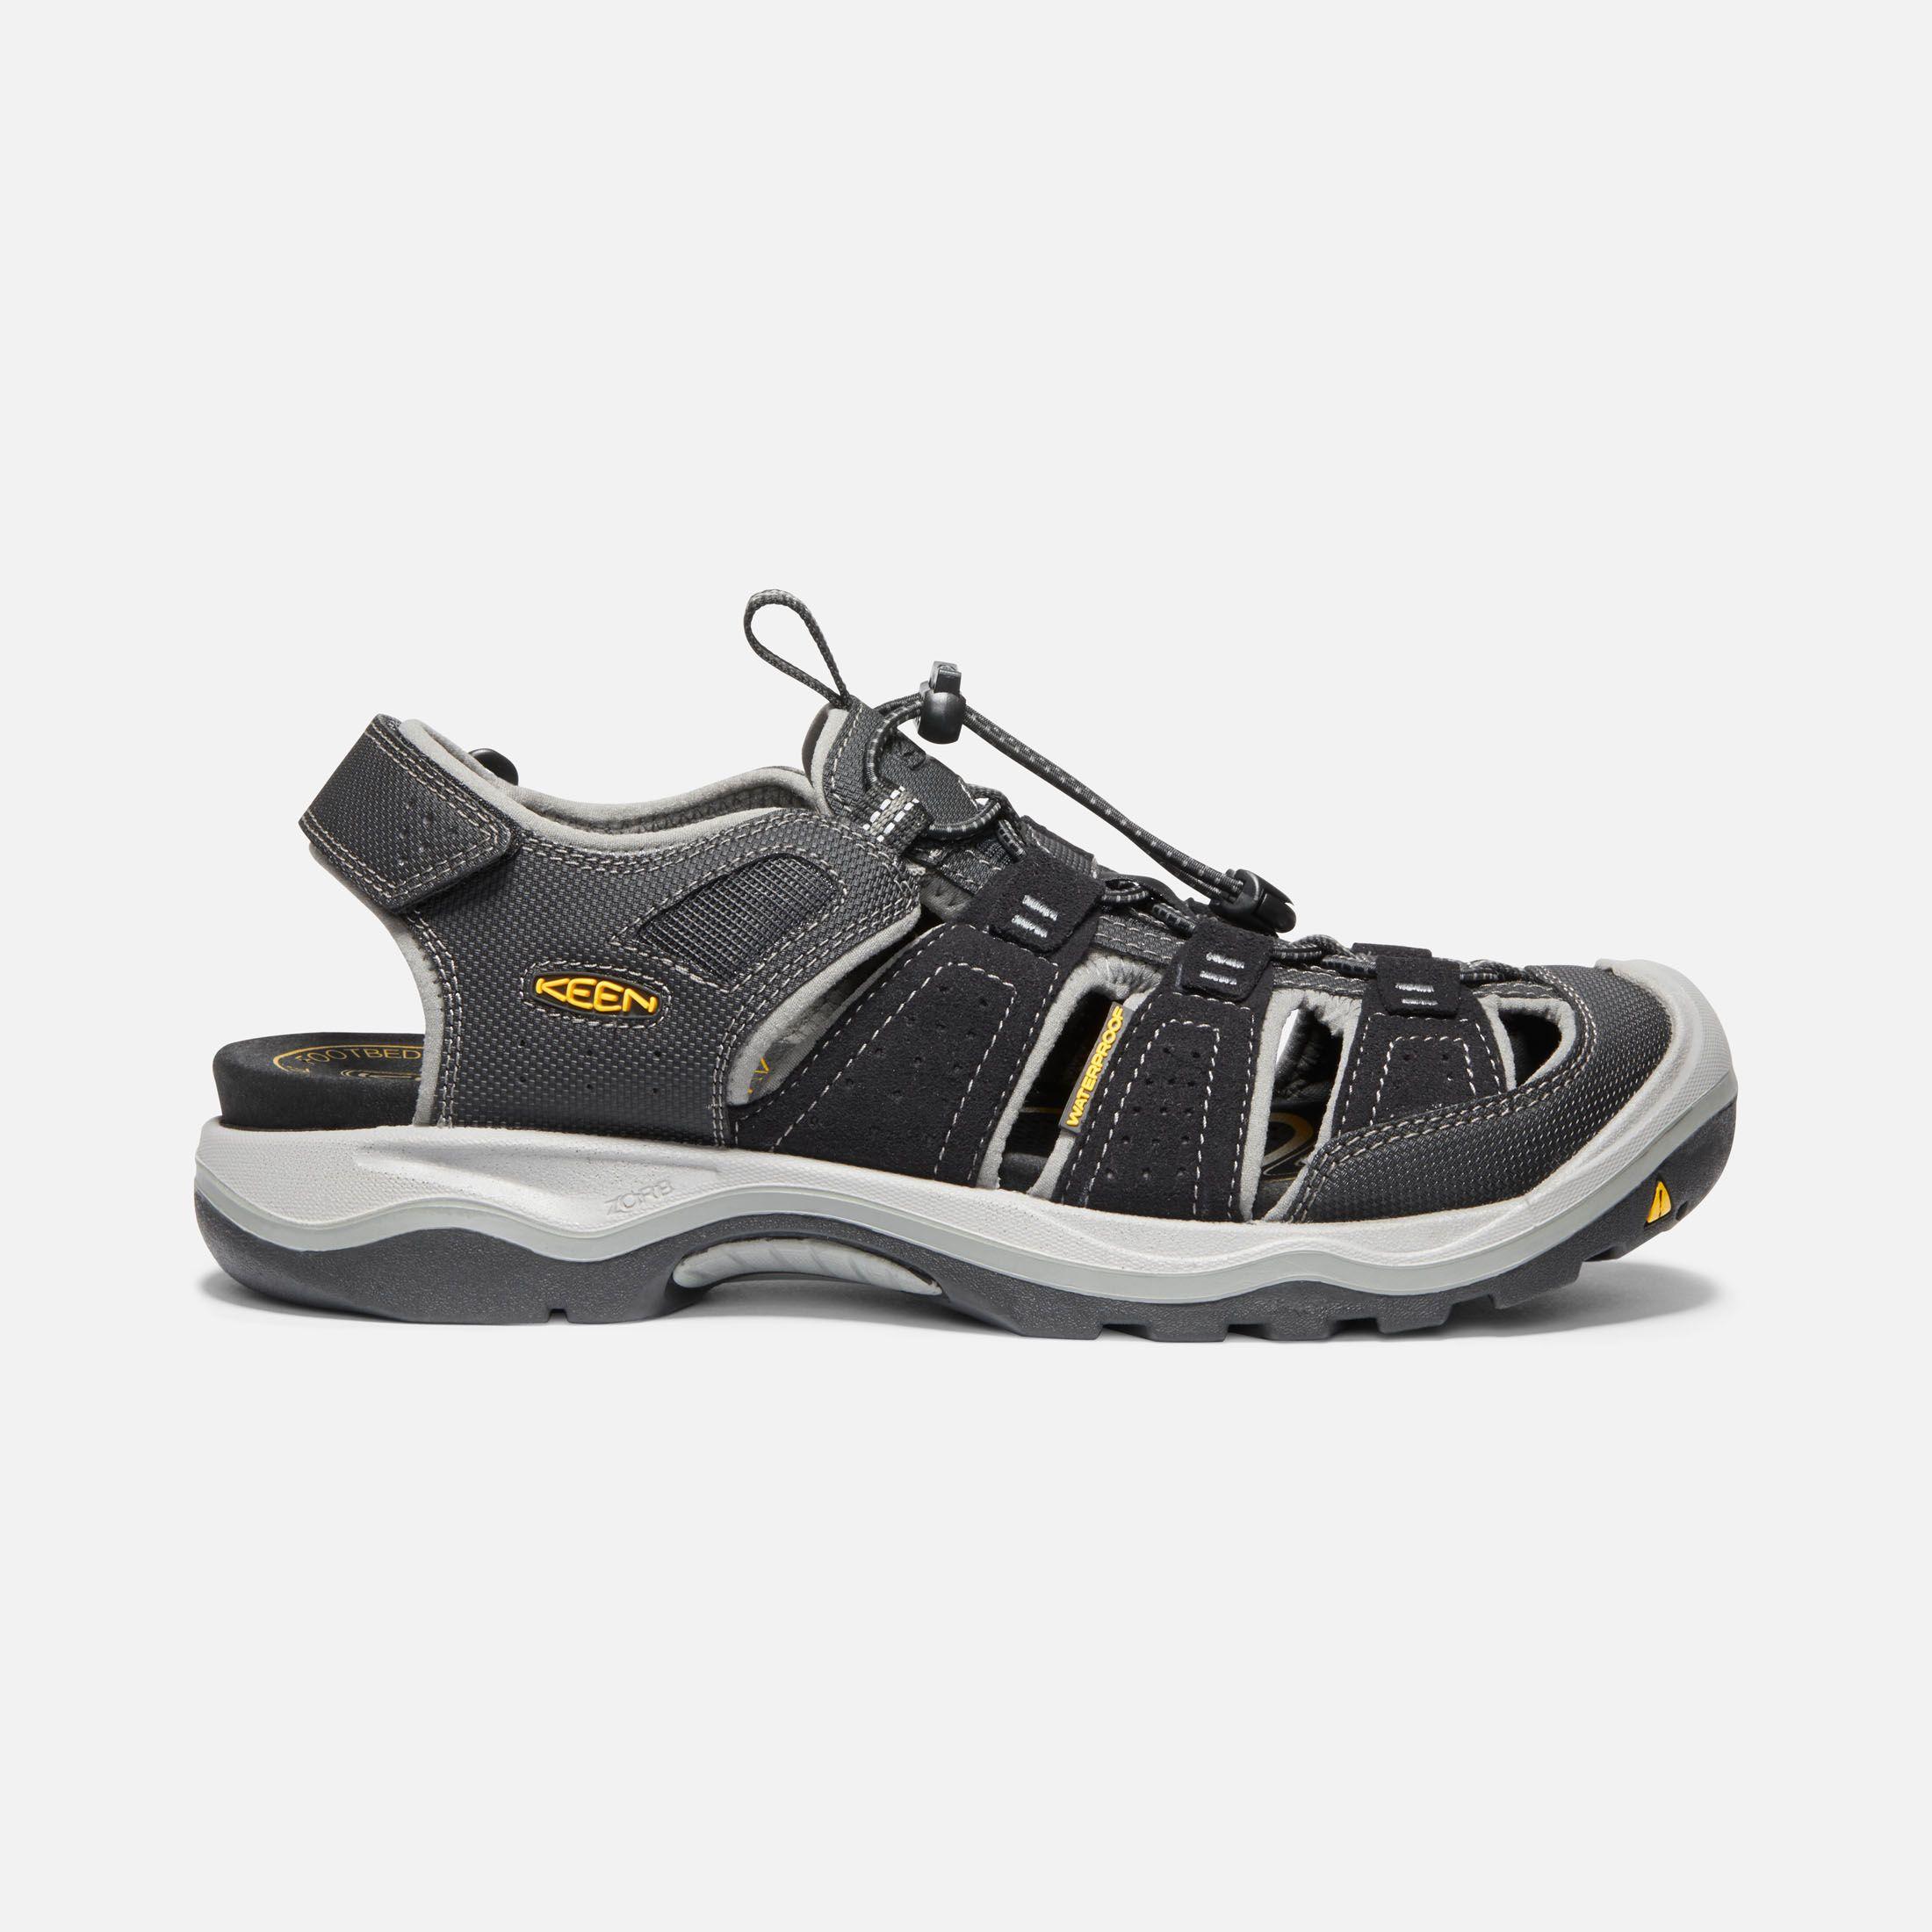 90b95906db16 Keen Men s Rialto II H2 Sandals Size 11.5